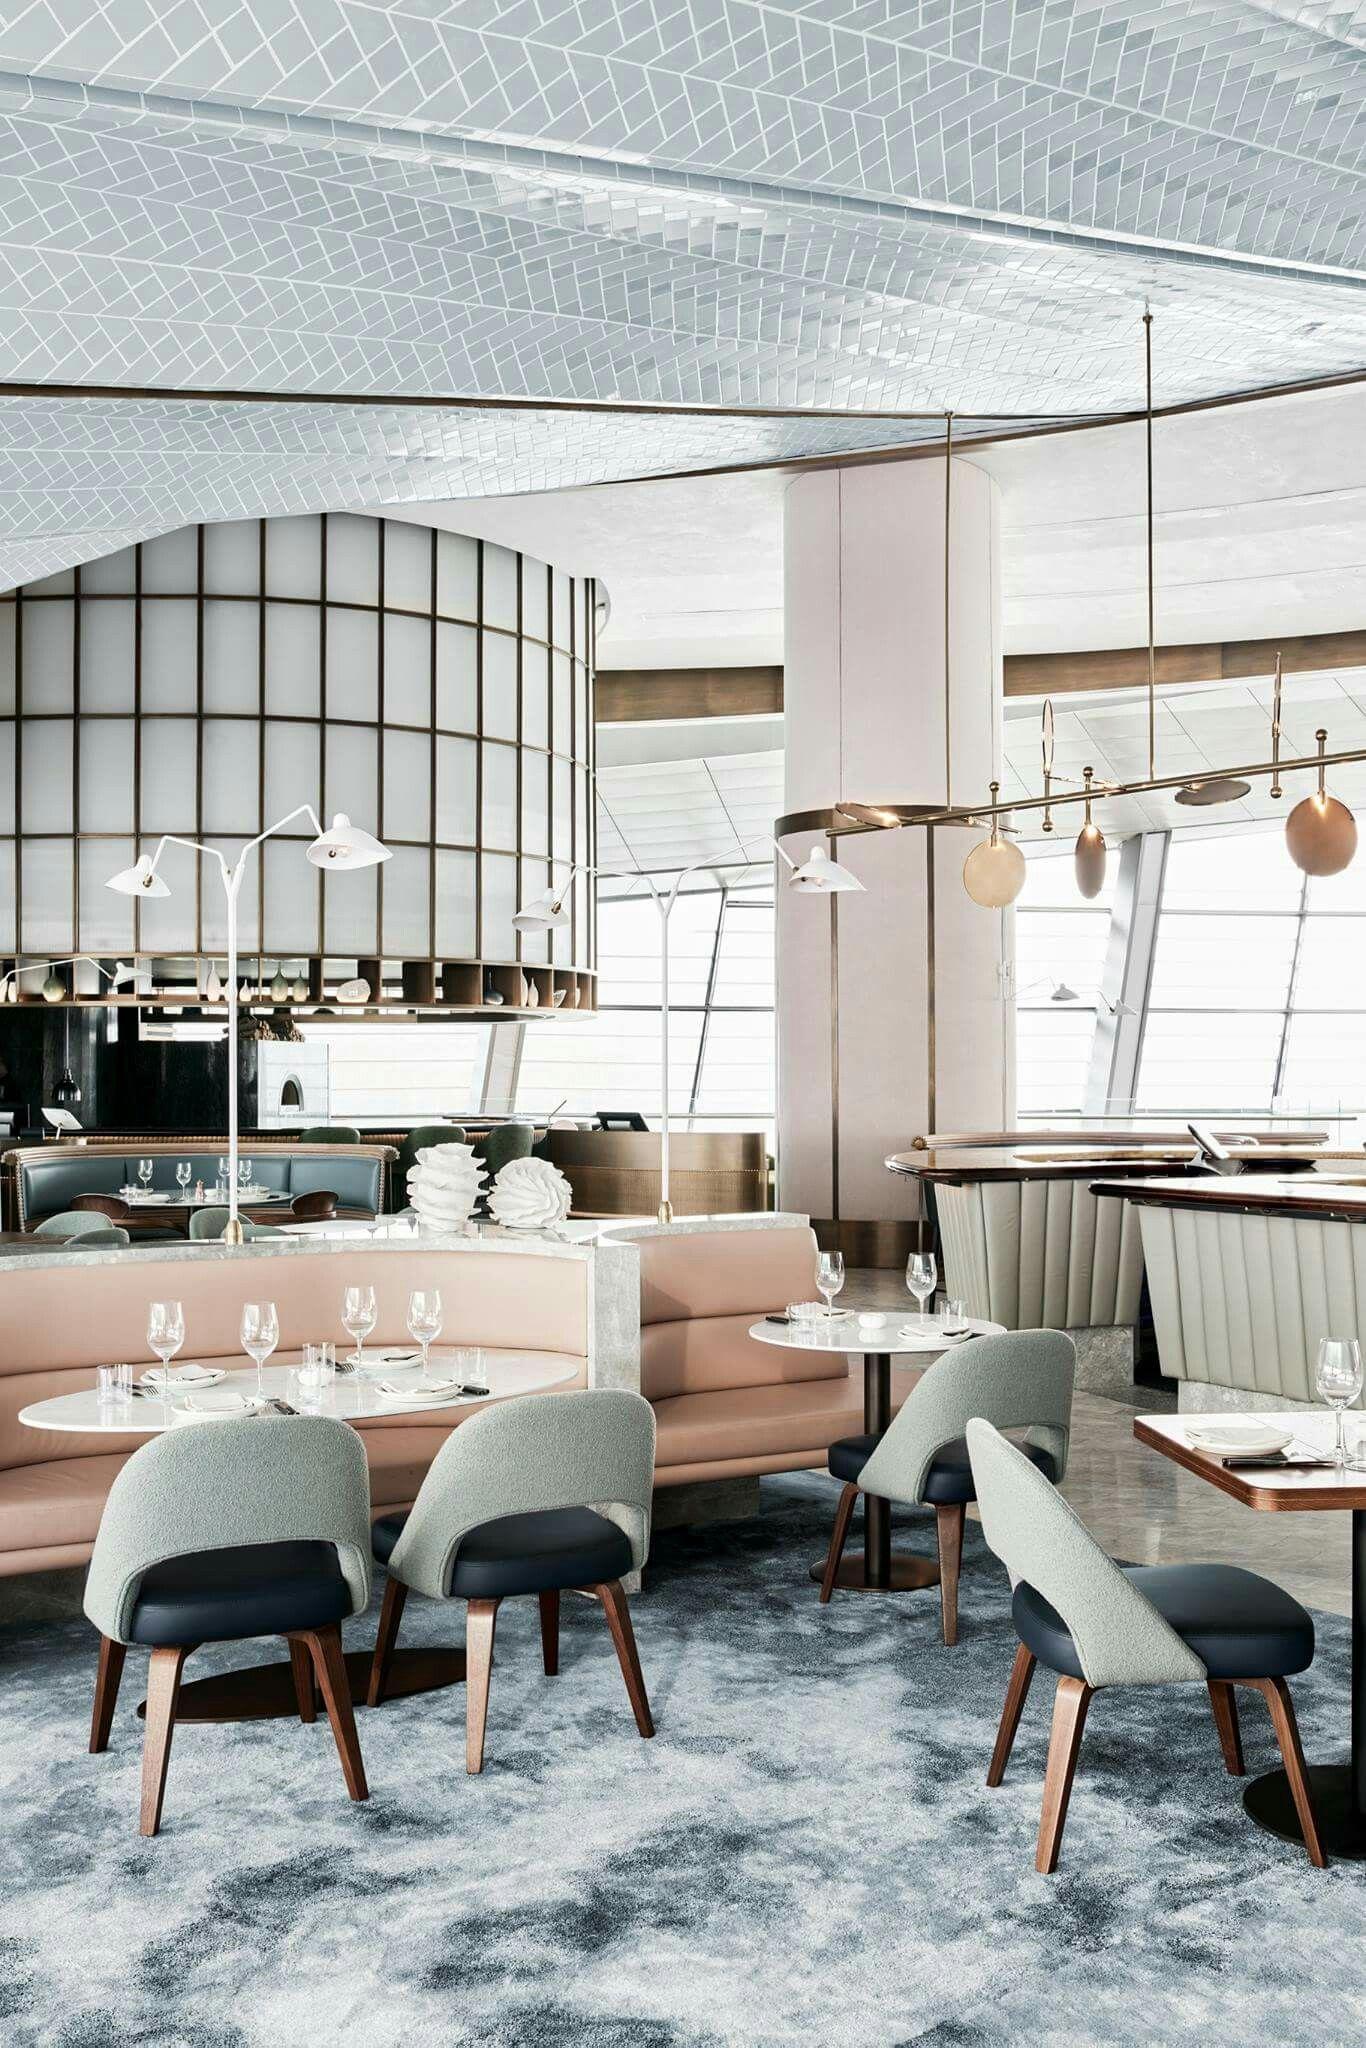 Interior design inspirations for your restaurant check more at brabbucontract com brabbu